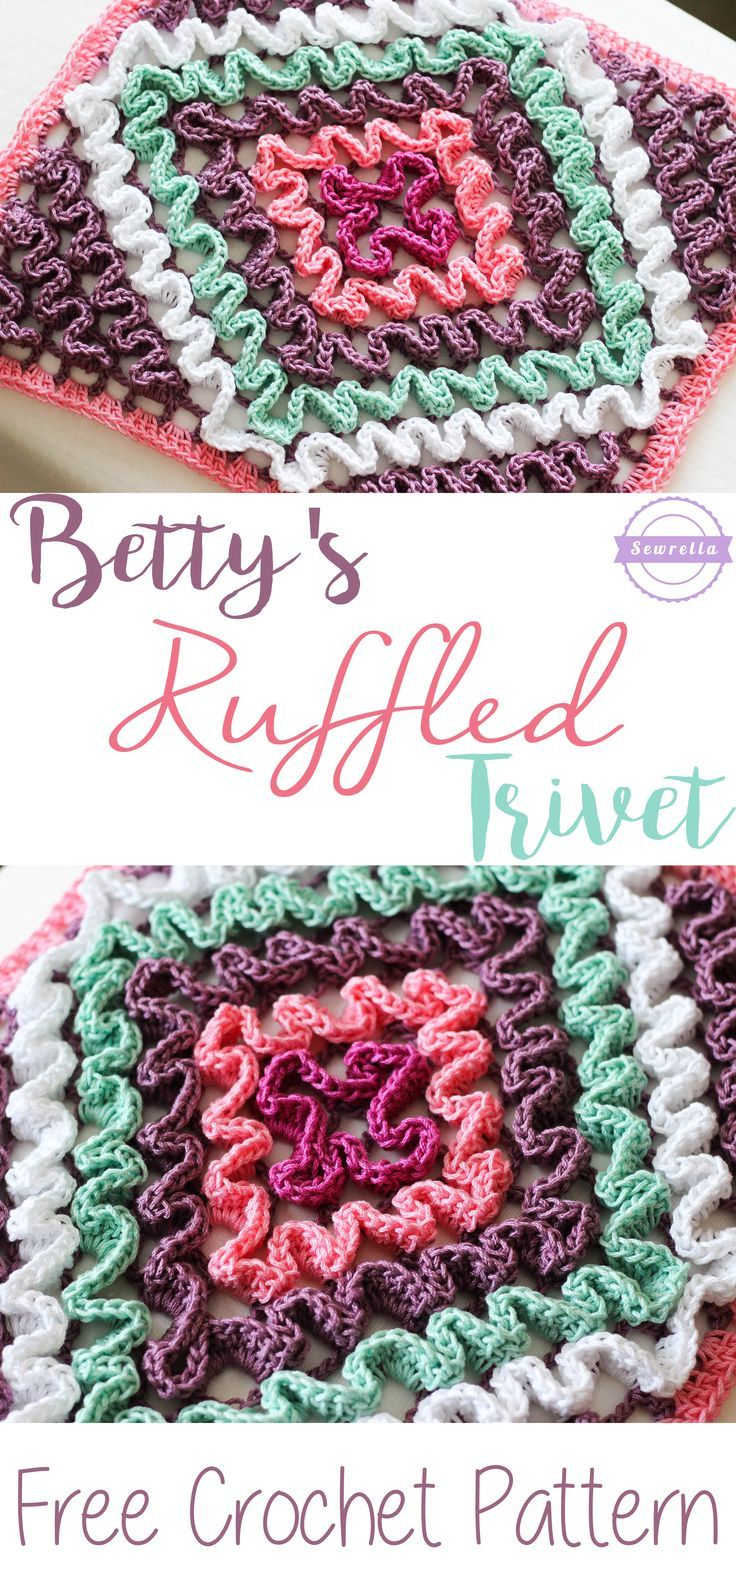 Betty's Ruffled Trivet   Free Crochet Pattern from Sewrella